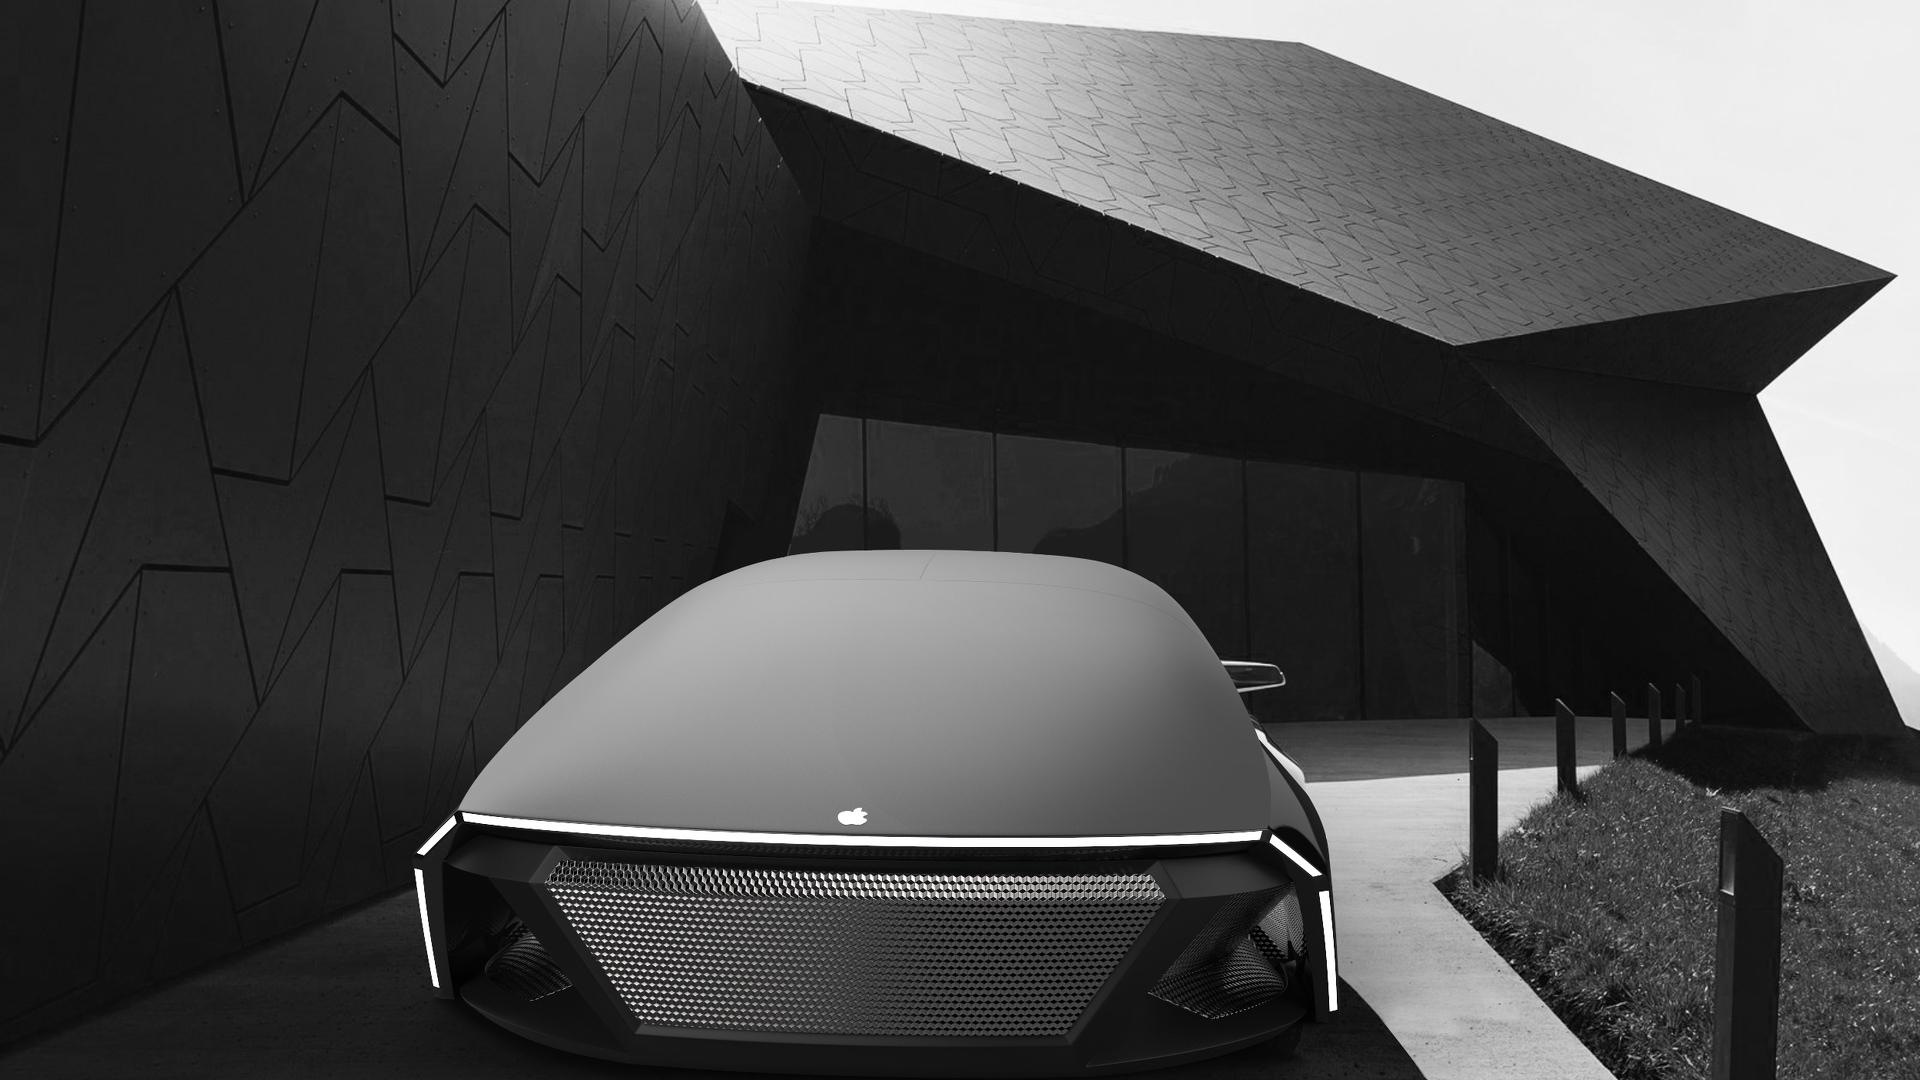 Apple Car 2076 Concept